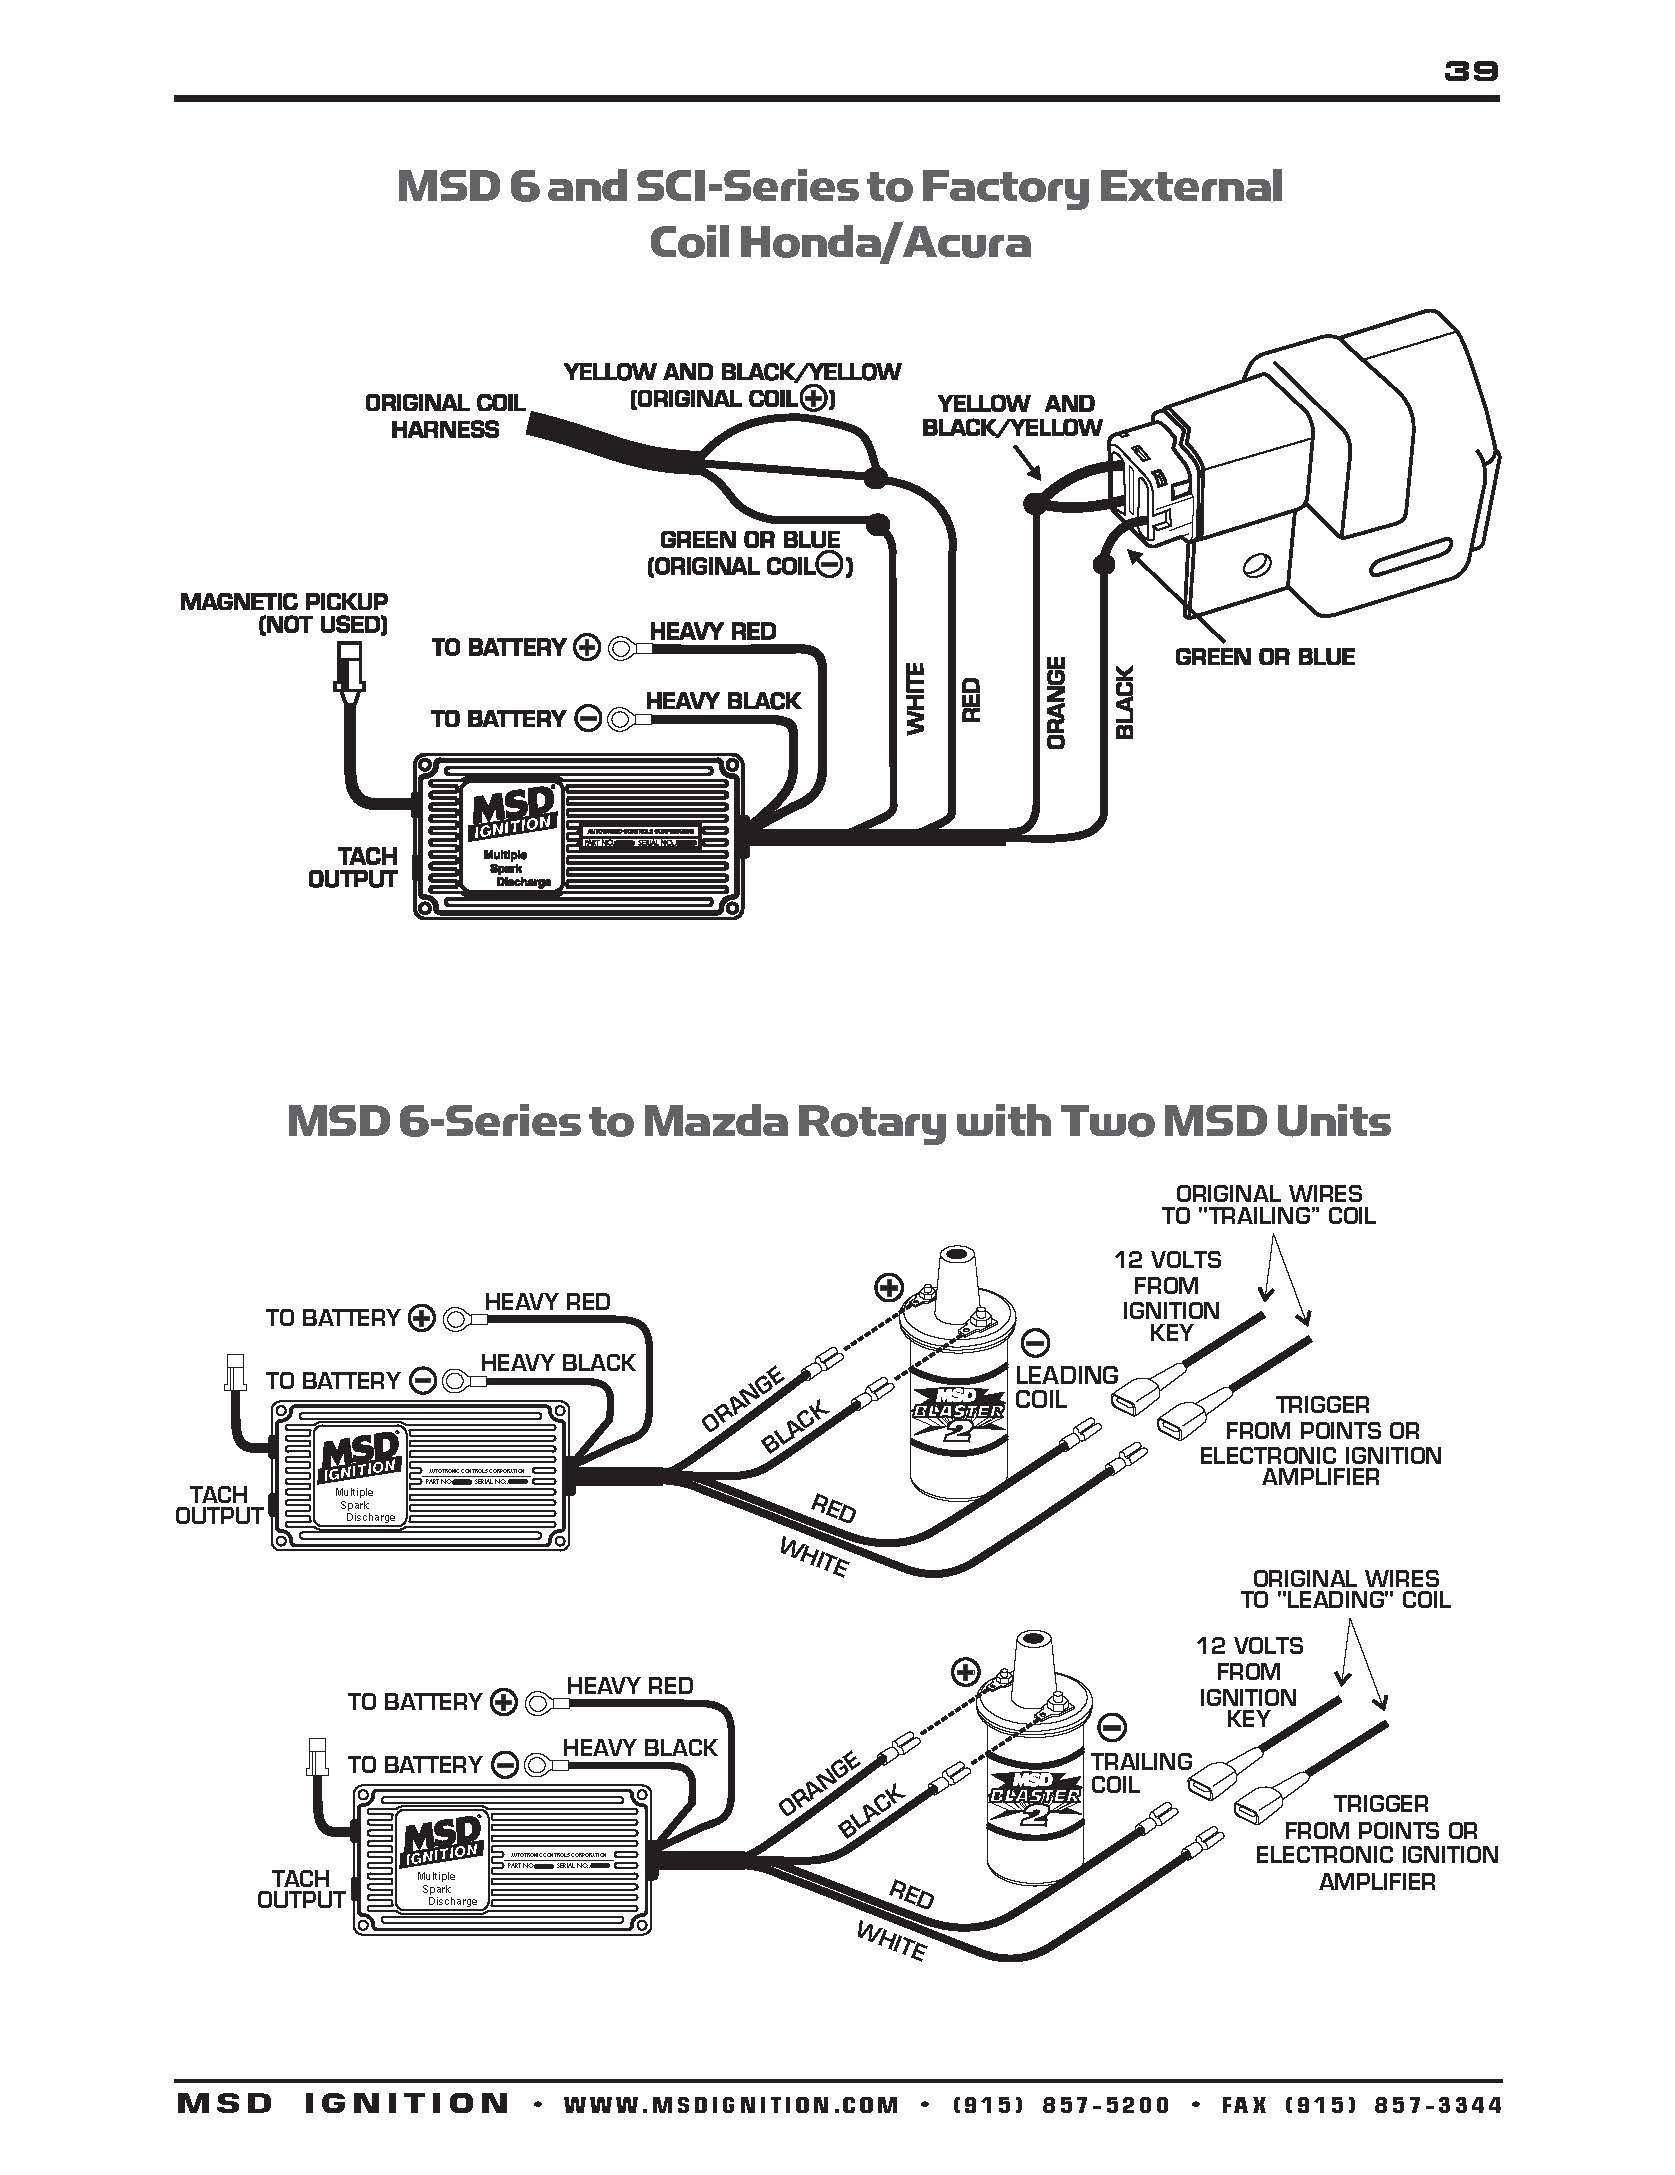 Msd Distributor Wiring Diagram Inspirational Wdtn Pn9615 Page 038 and Msd Distributor Wiring Diagram Wiring Diagram